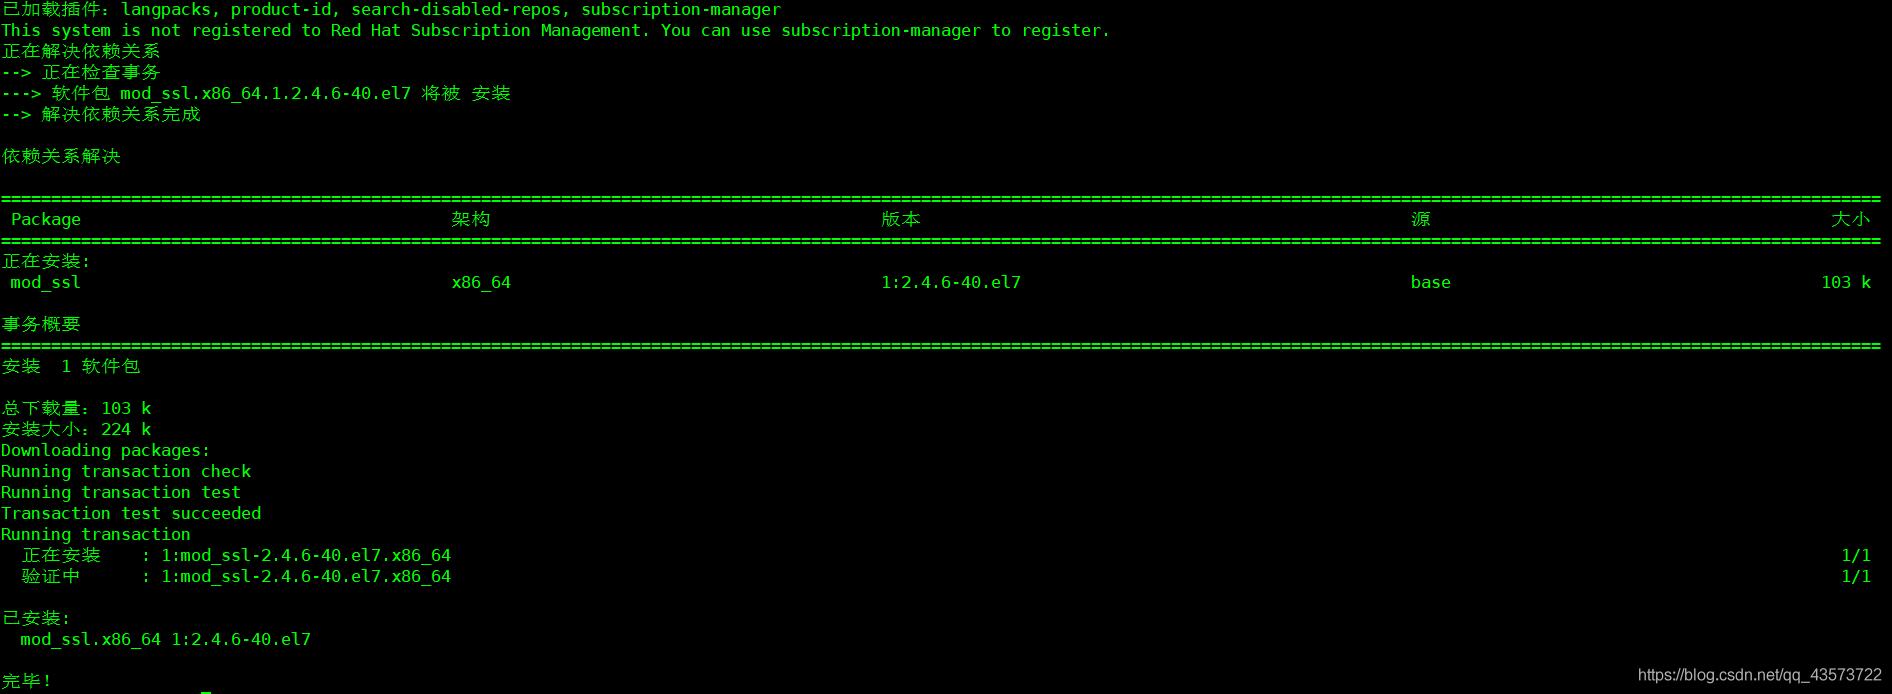 Linux下搭建Web网站_qq_43573722的博客-CSDN博客_linux搭建web